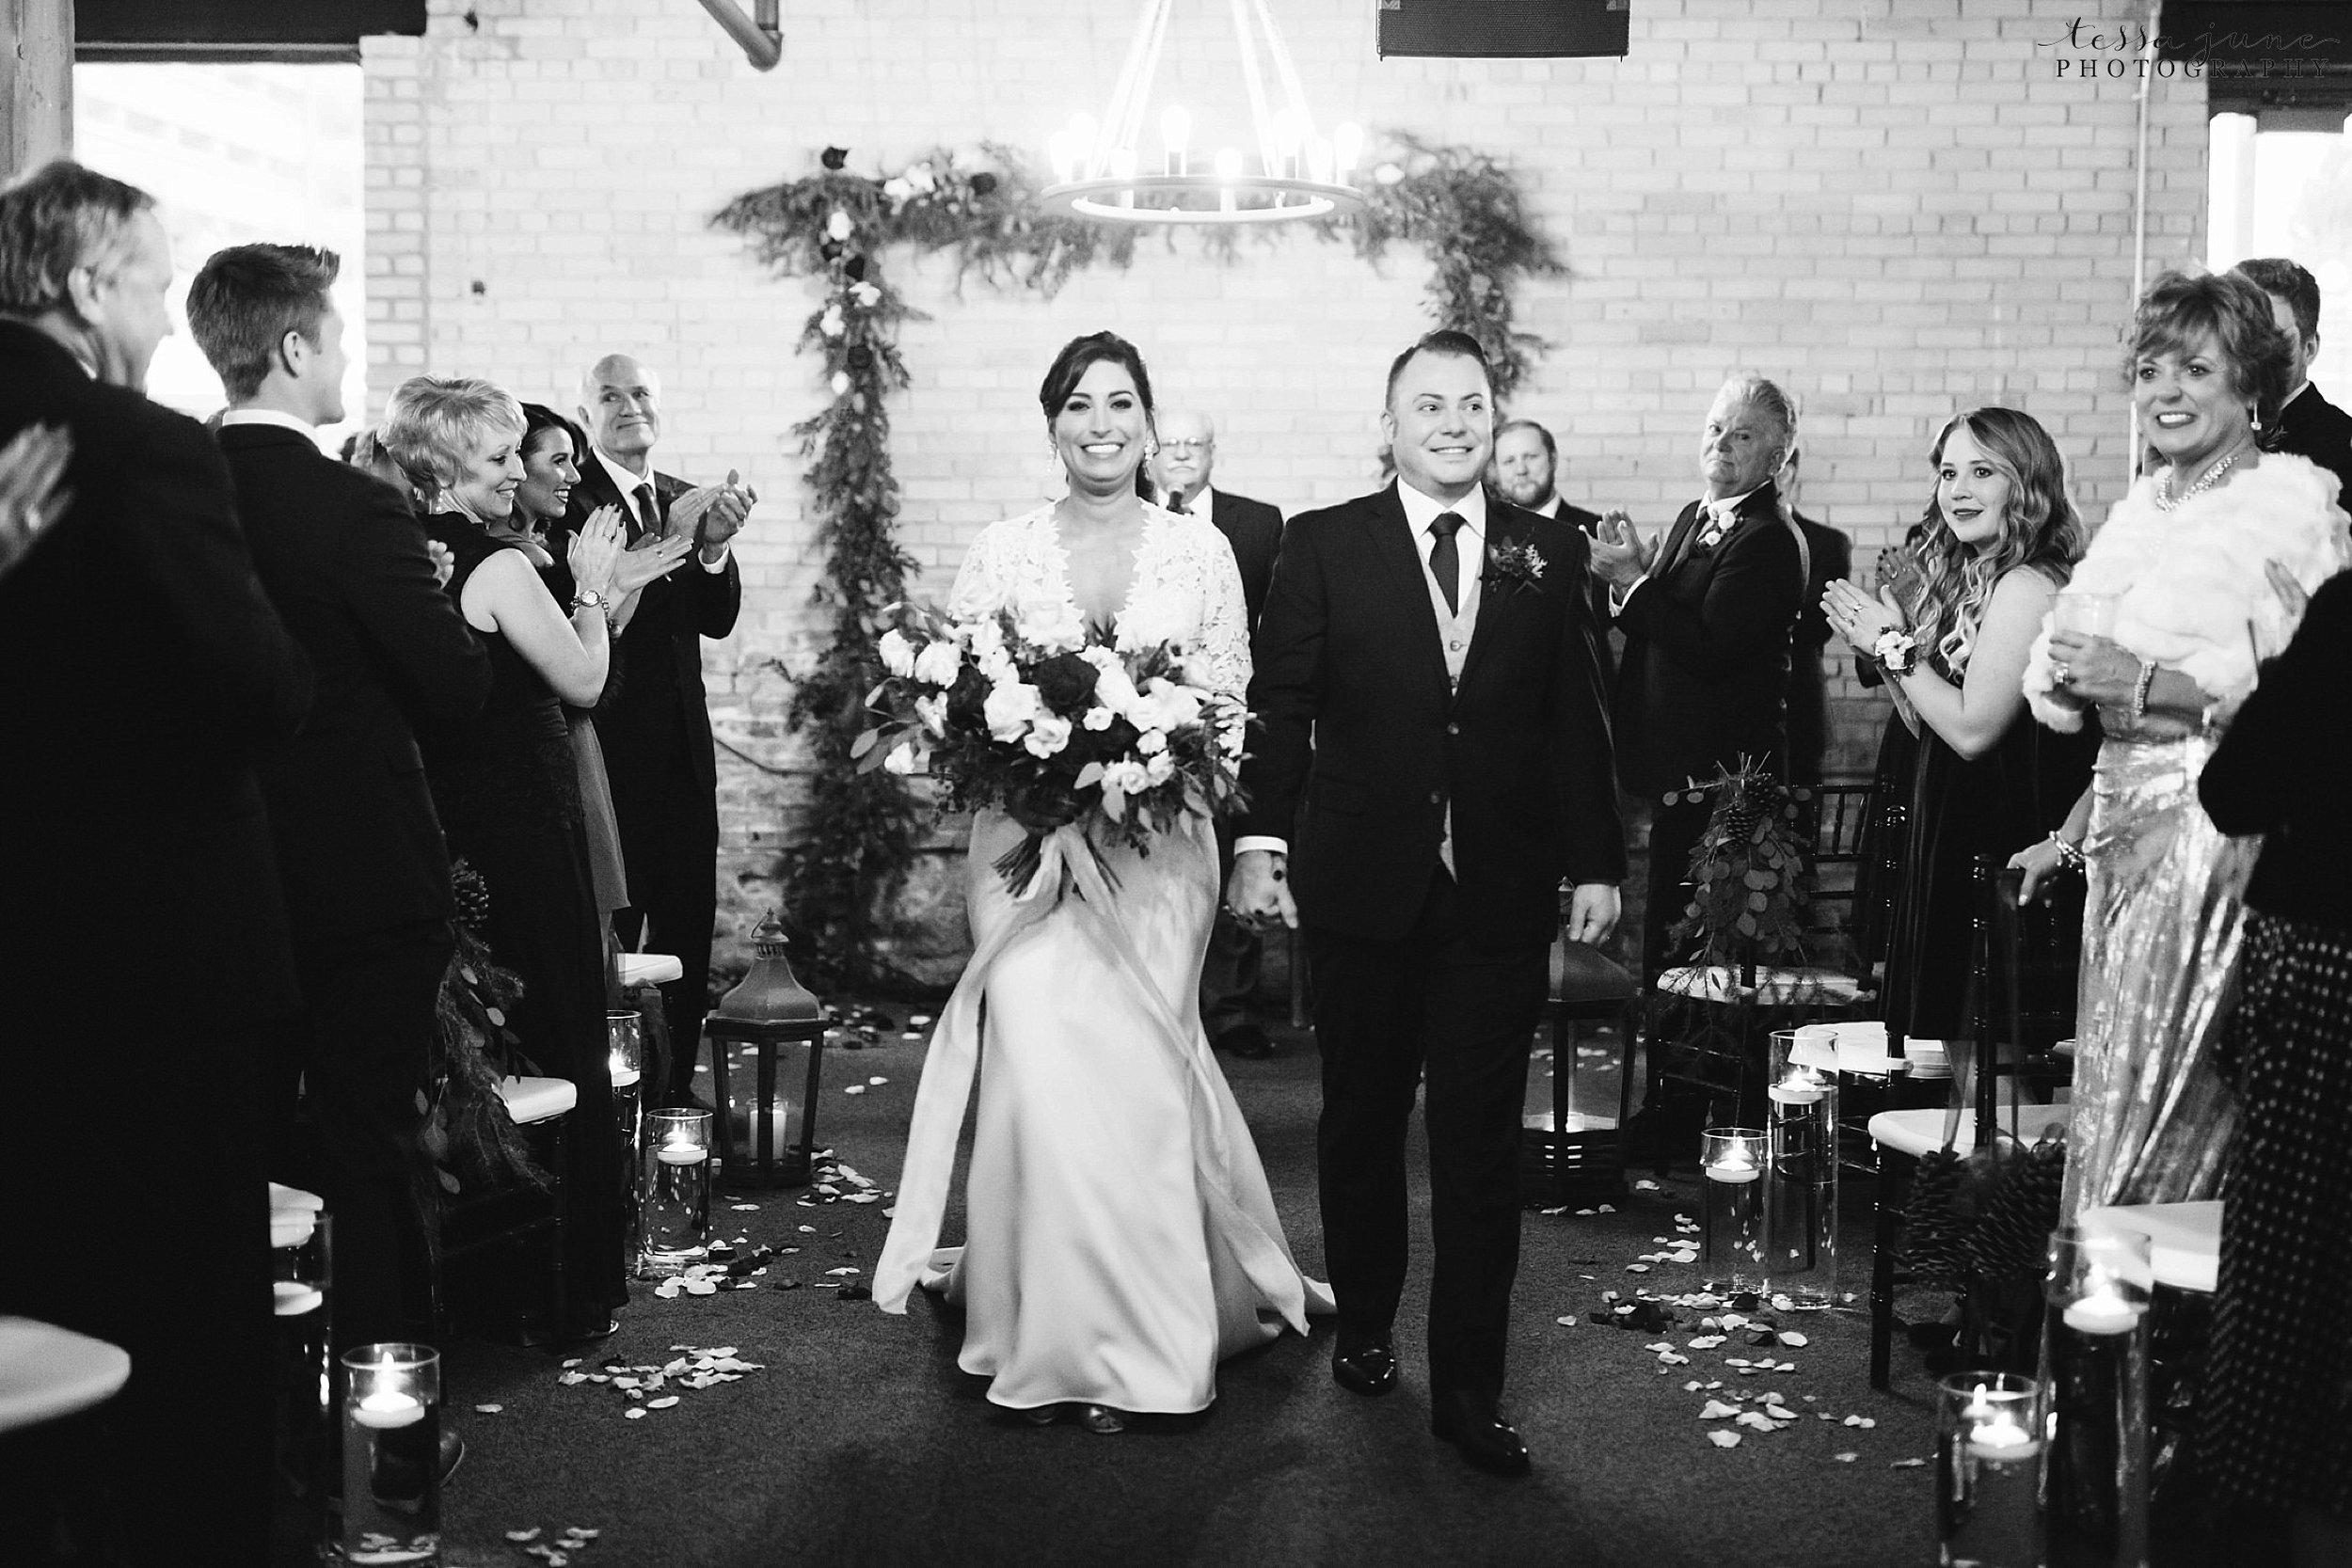 minneapolis-event-center-winter-romantic-snow-wedding-december-151.jpg